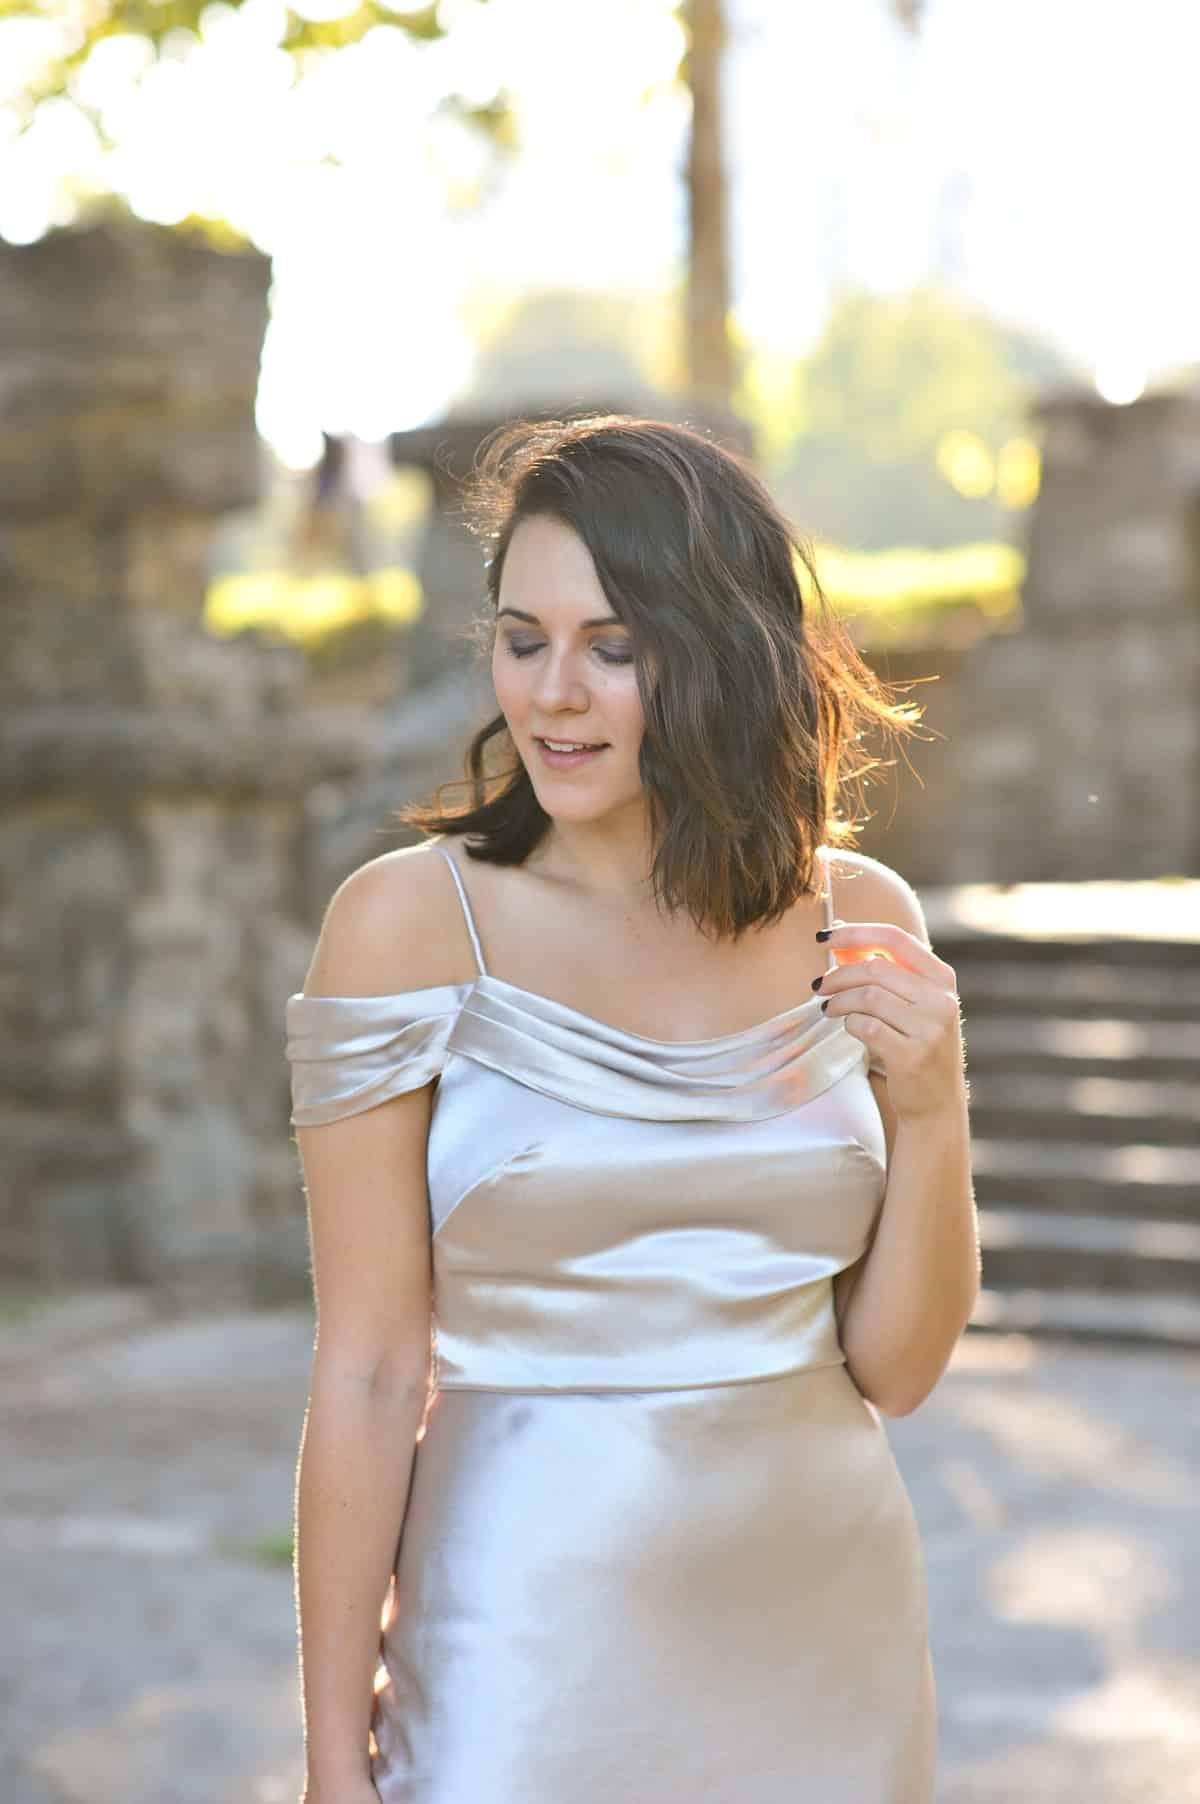 Bhldn sabine holiday dress, holiday wedding dress ideas via @mystylevita